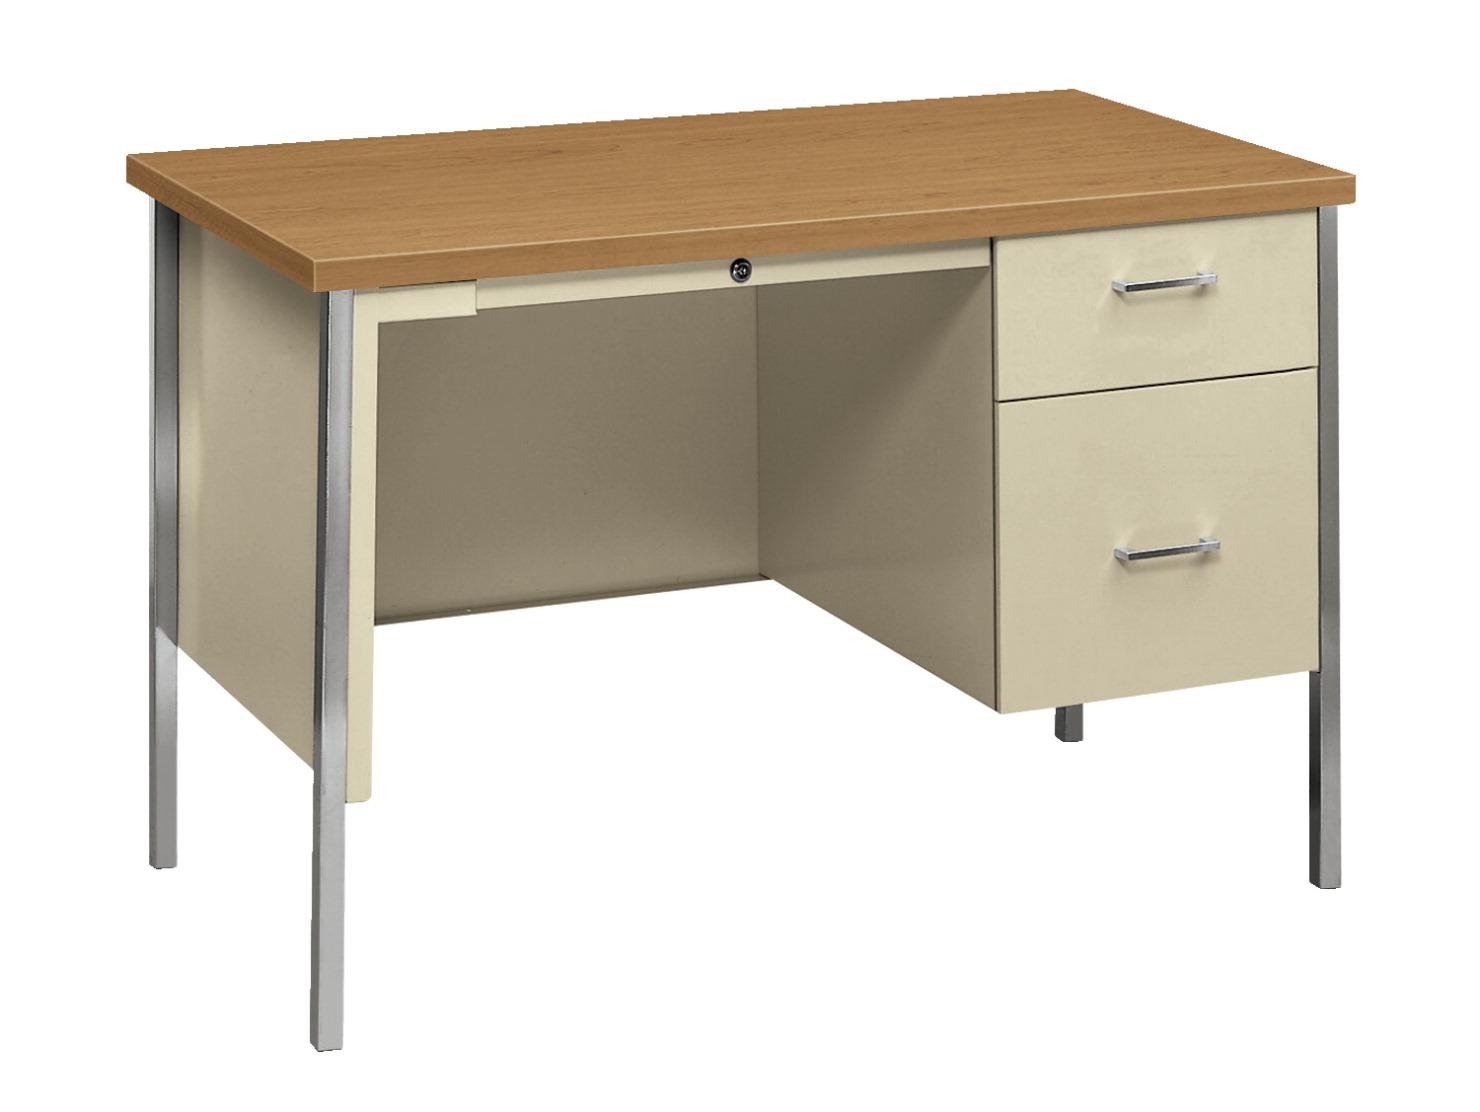 Classroom select pedestal steel desk school specialty canada - Metal office desk ...